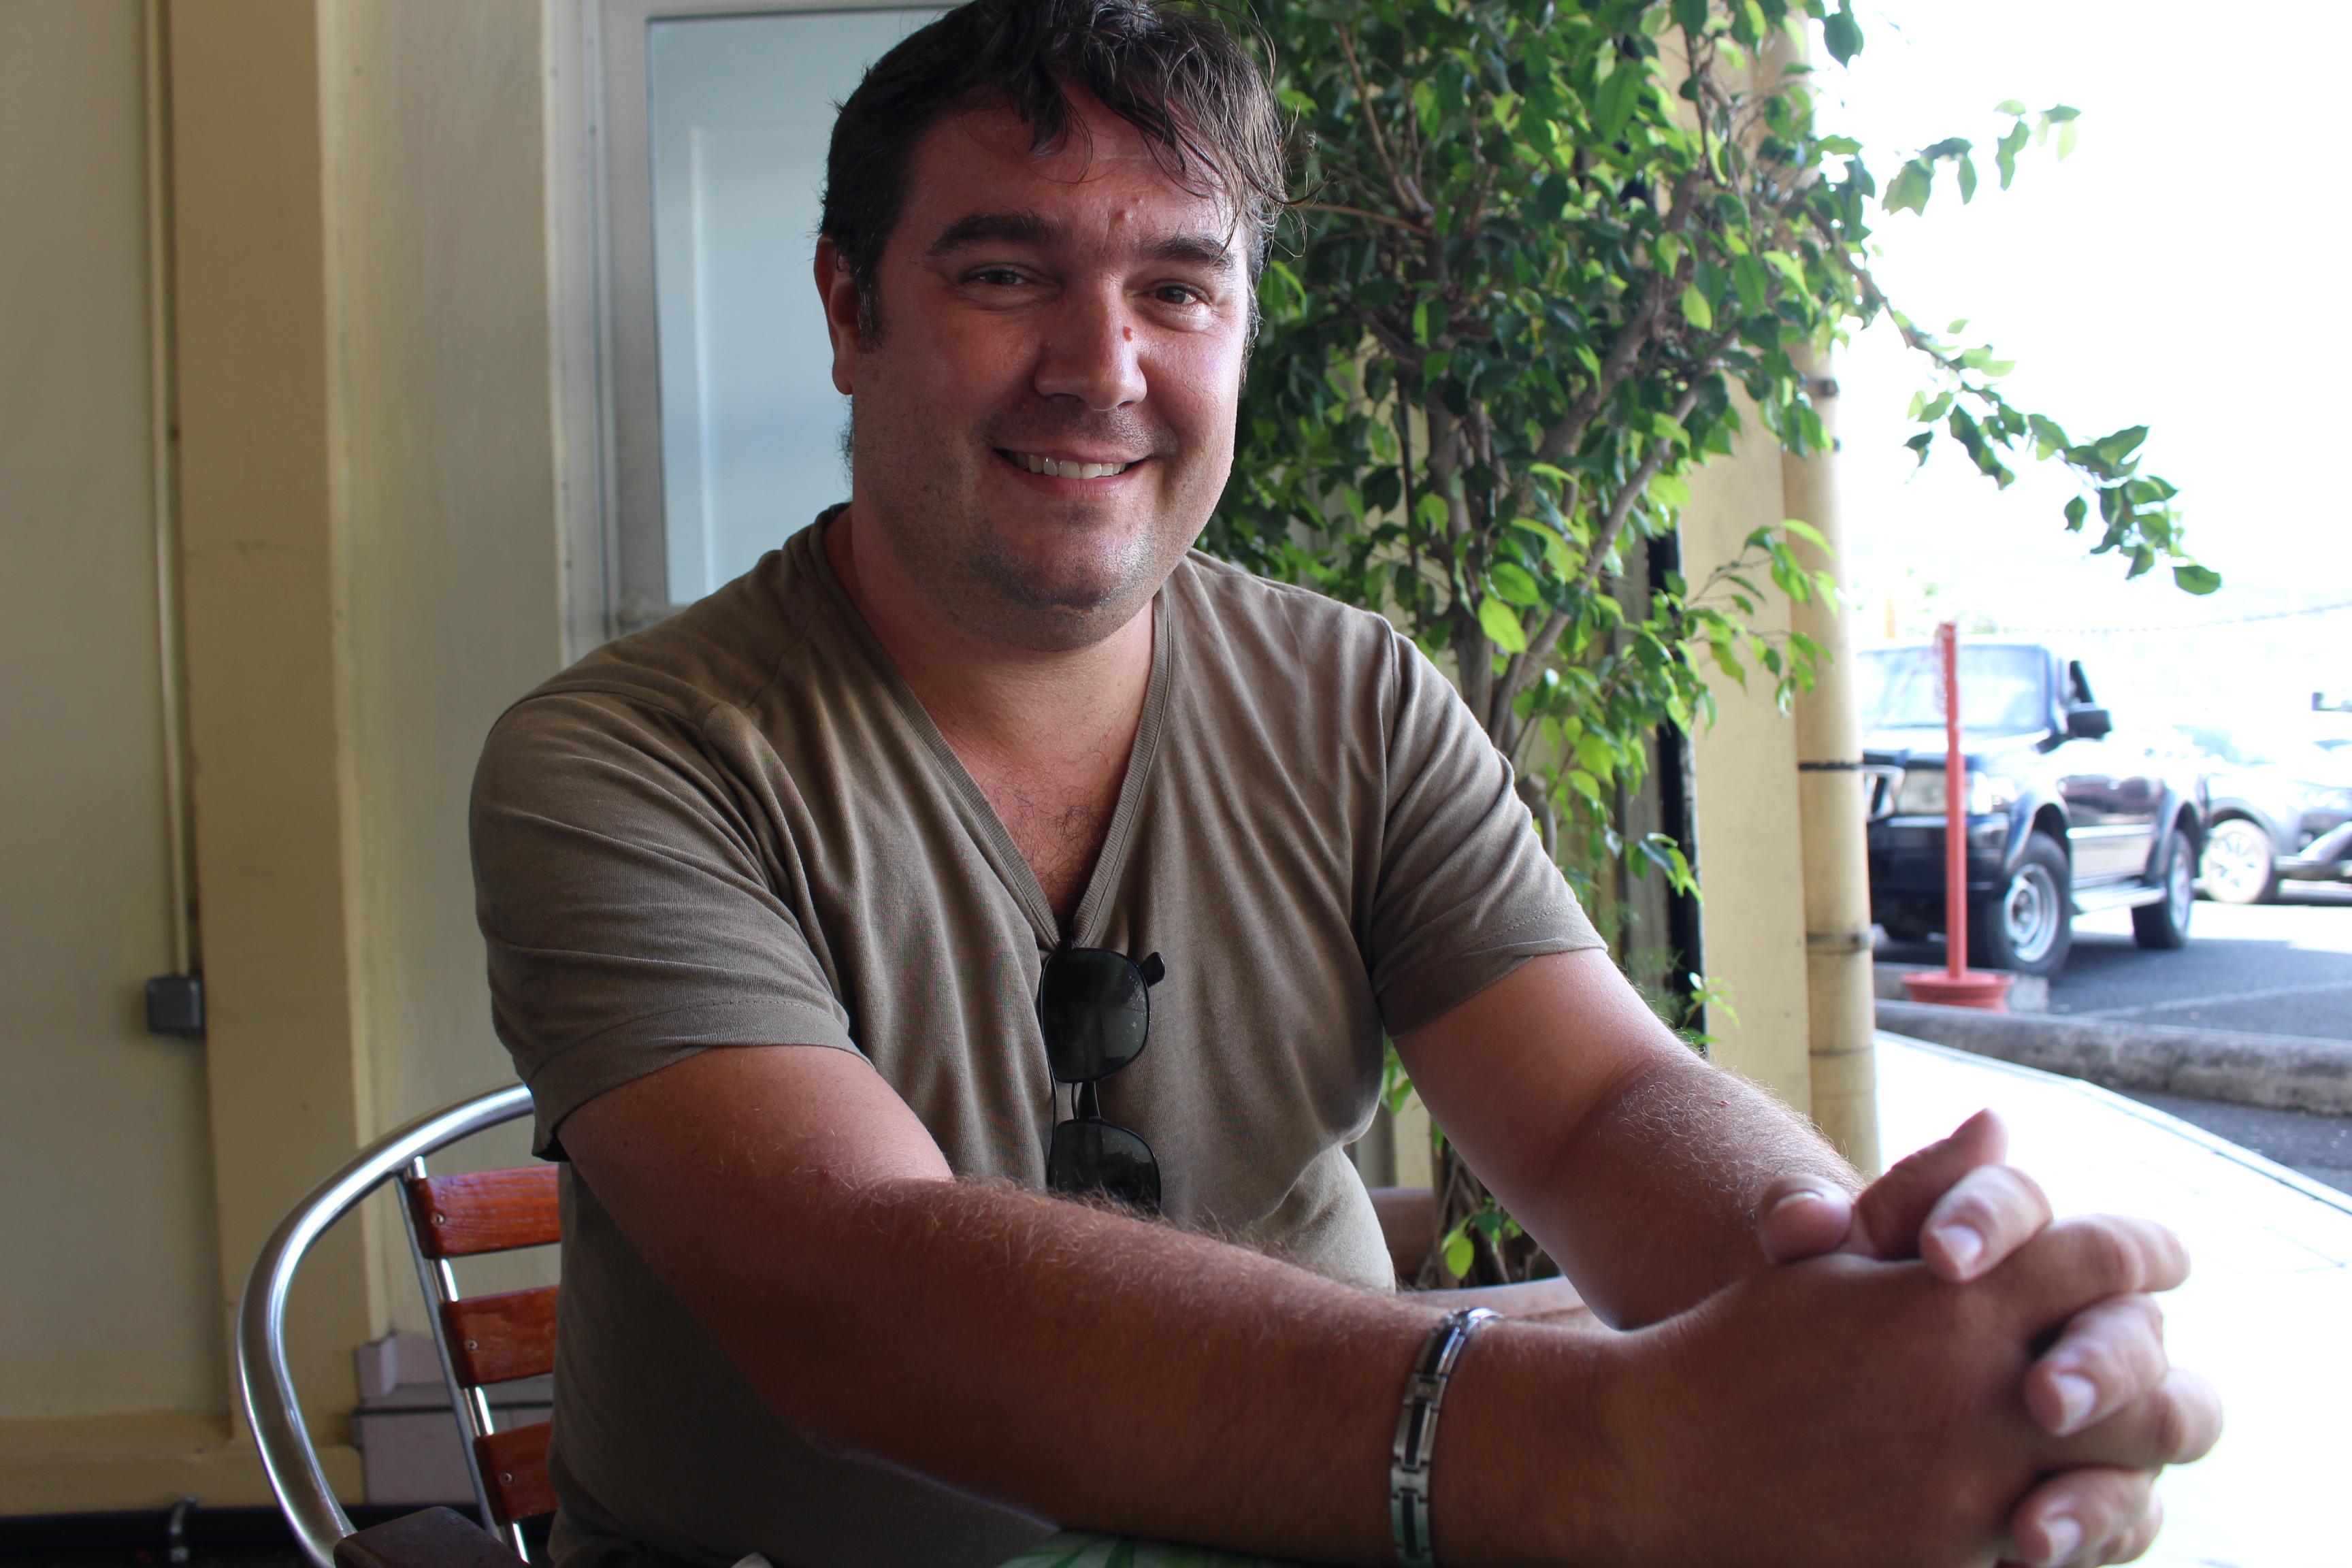 Mon tane est farani, la nouvelle pièce de Stéphane Martino